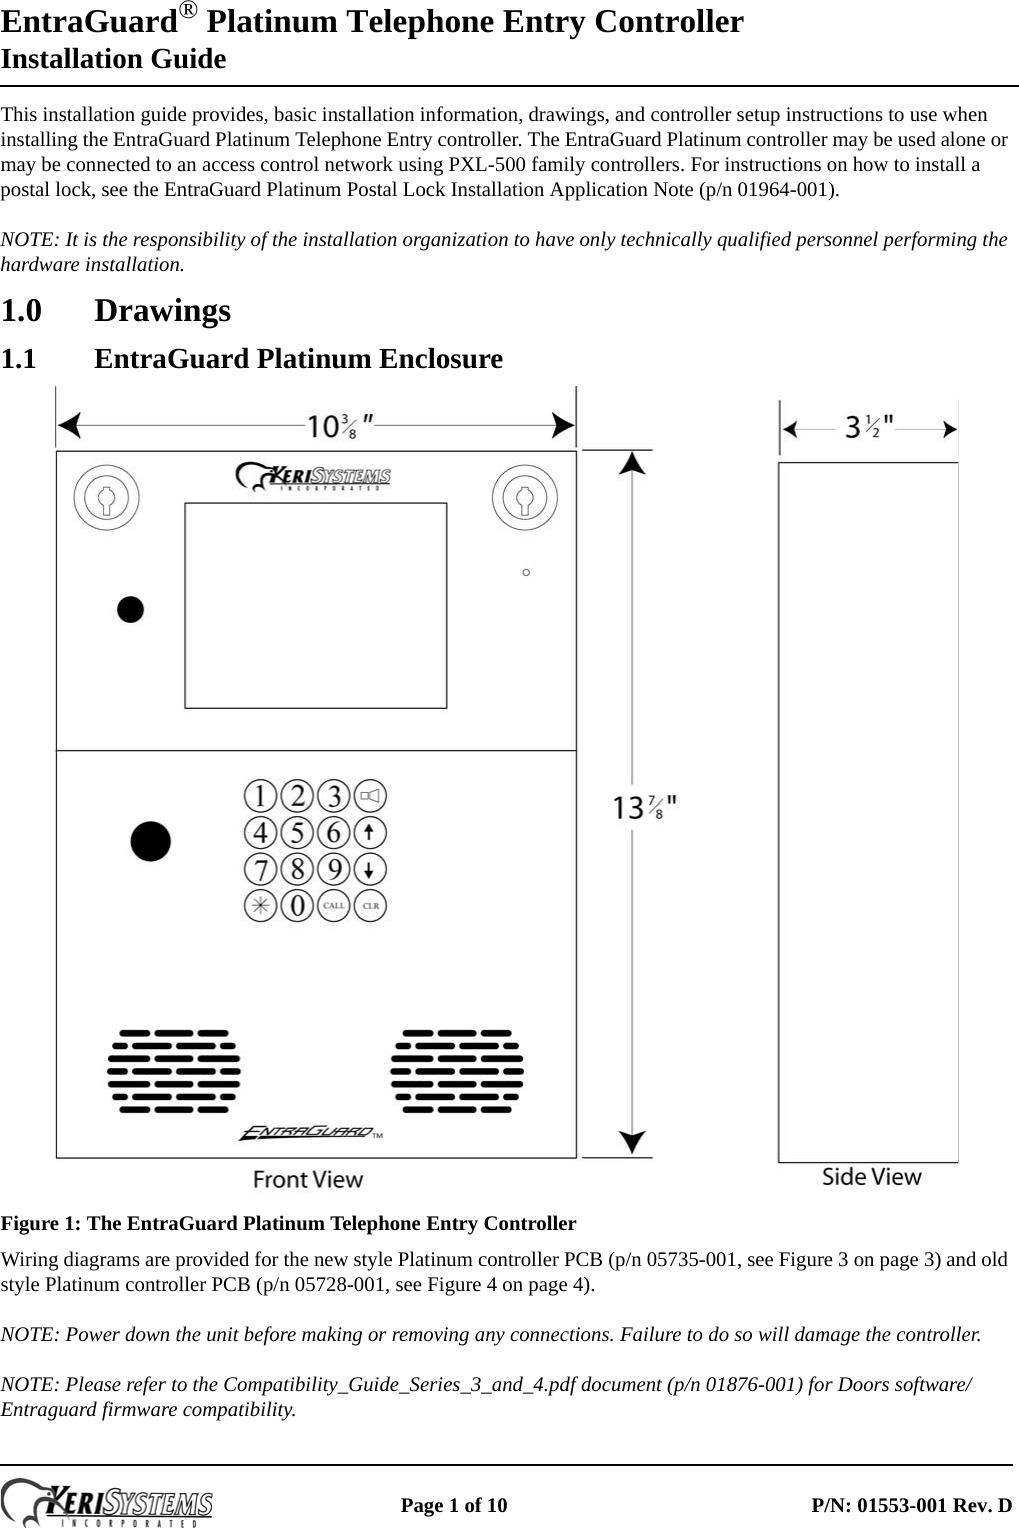 [ZTBE_9966]  Keri Systems EntraGuard_Platinum_Installation_Guide Entra Guard Platinum  Telephone Entry Controller Installation Guide Entraguard | Keri Access Wiring Diagram |  | UserManual.wiki